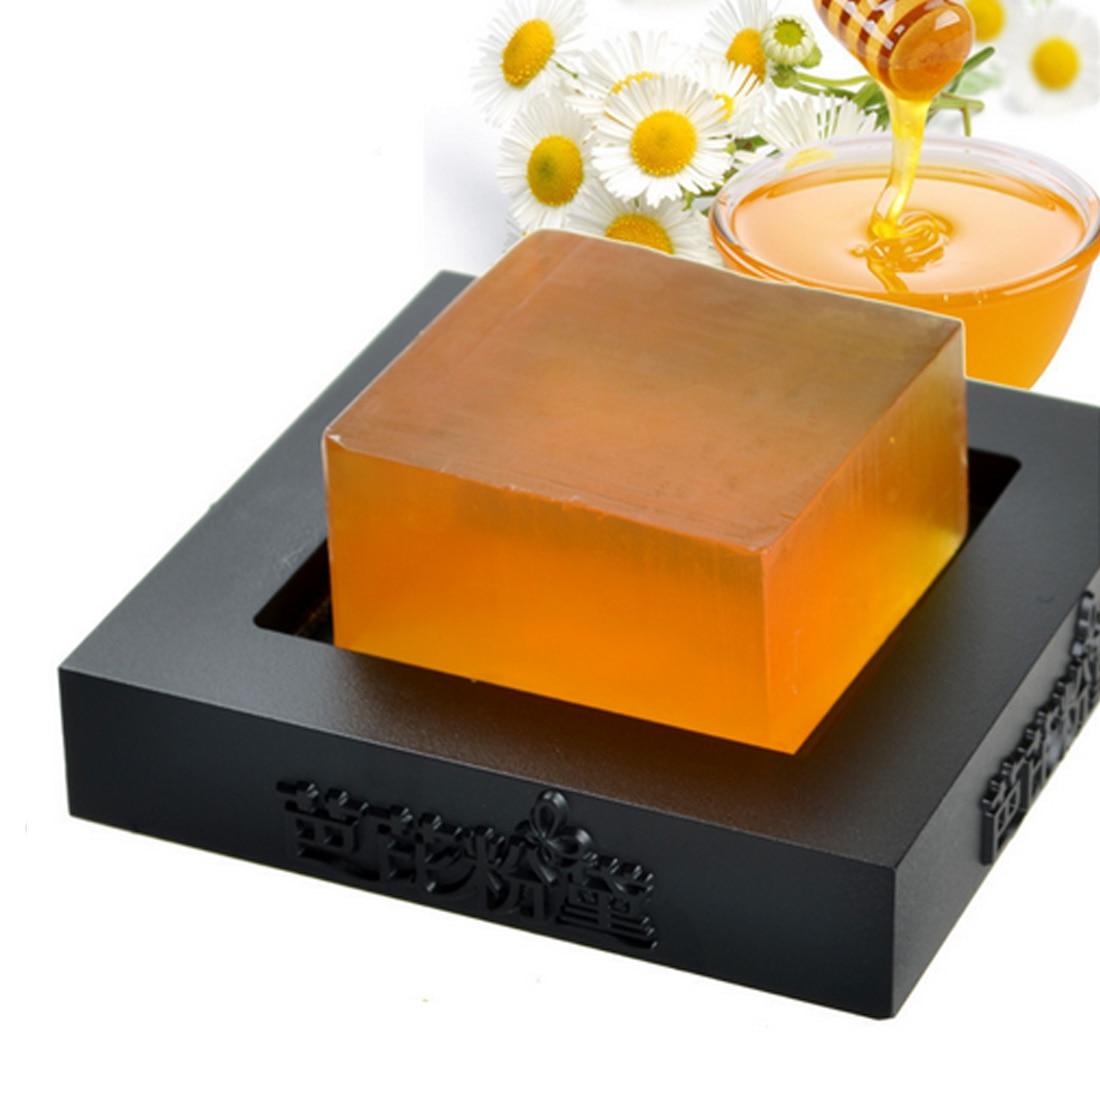 Hot Sale 100% HandMade Whitening Peeling Glutathione Arbutin Honey Kojic Acid Soap 100g